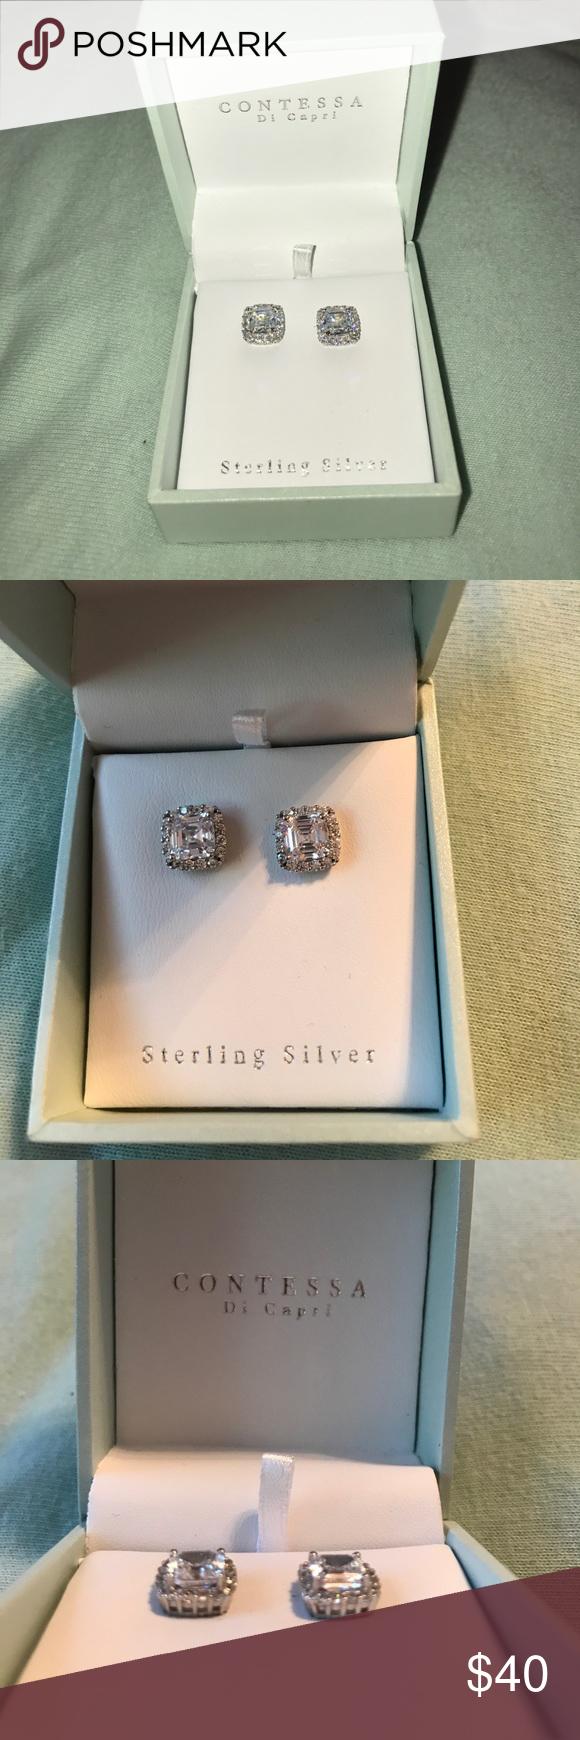 e46f4f4d4 Contessa Di Capri Stud Earrings BRAND NEW stunning Contessa Di Capri  sterling silver stud earrings! Make an offer! 😊 Jewelry Earrings